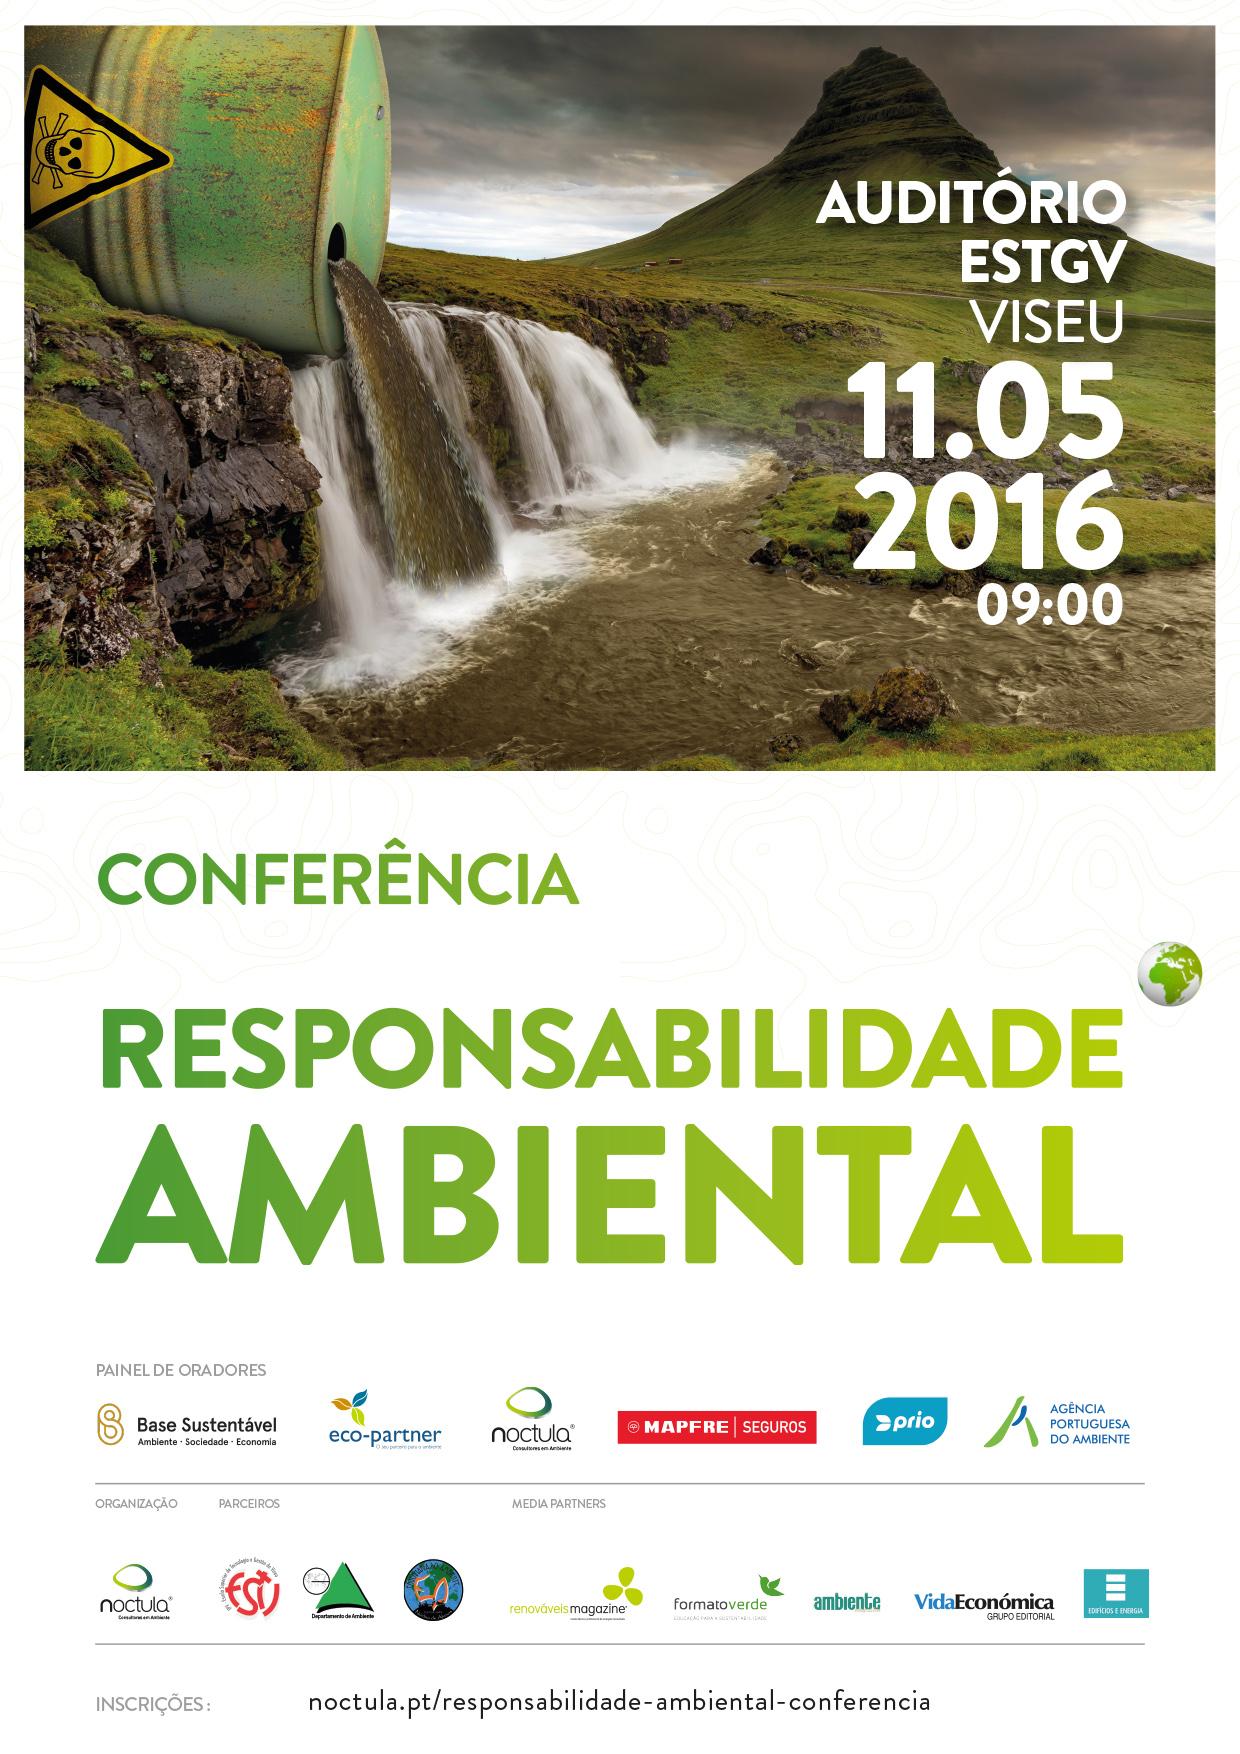 Conferência Responsabilidade Ambiental